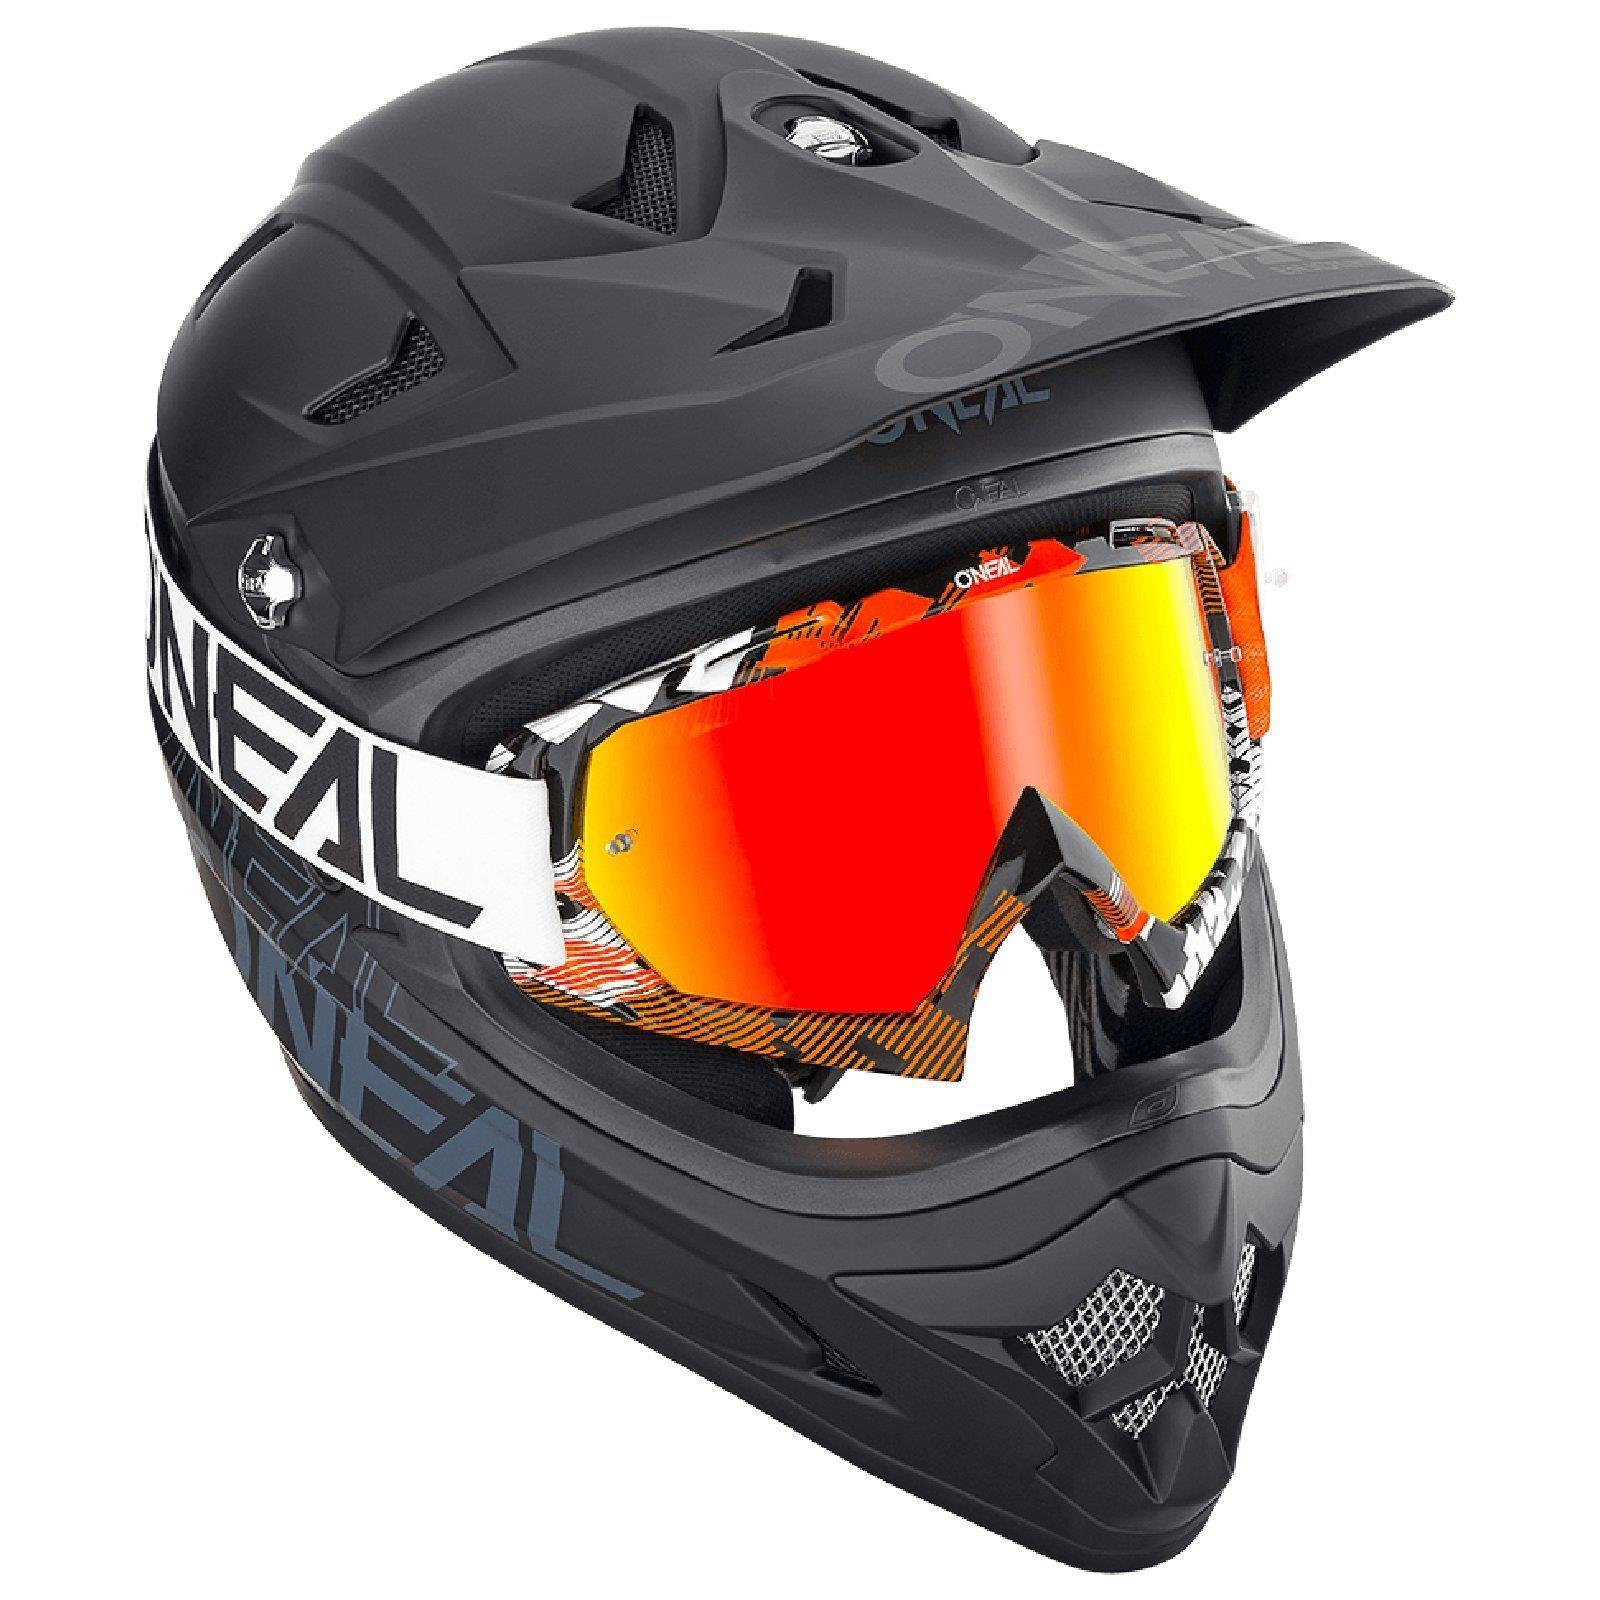 miniatuur 11 - O'Neal B-10 Goggle Pixel Radium Moto Cross Brille Downhill AntiFog Mountainbike